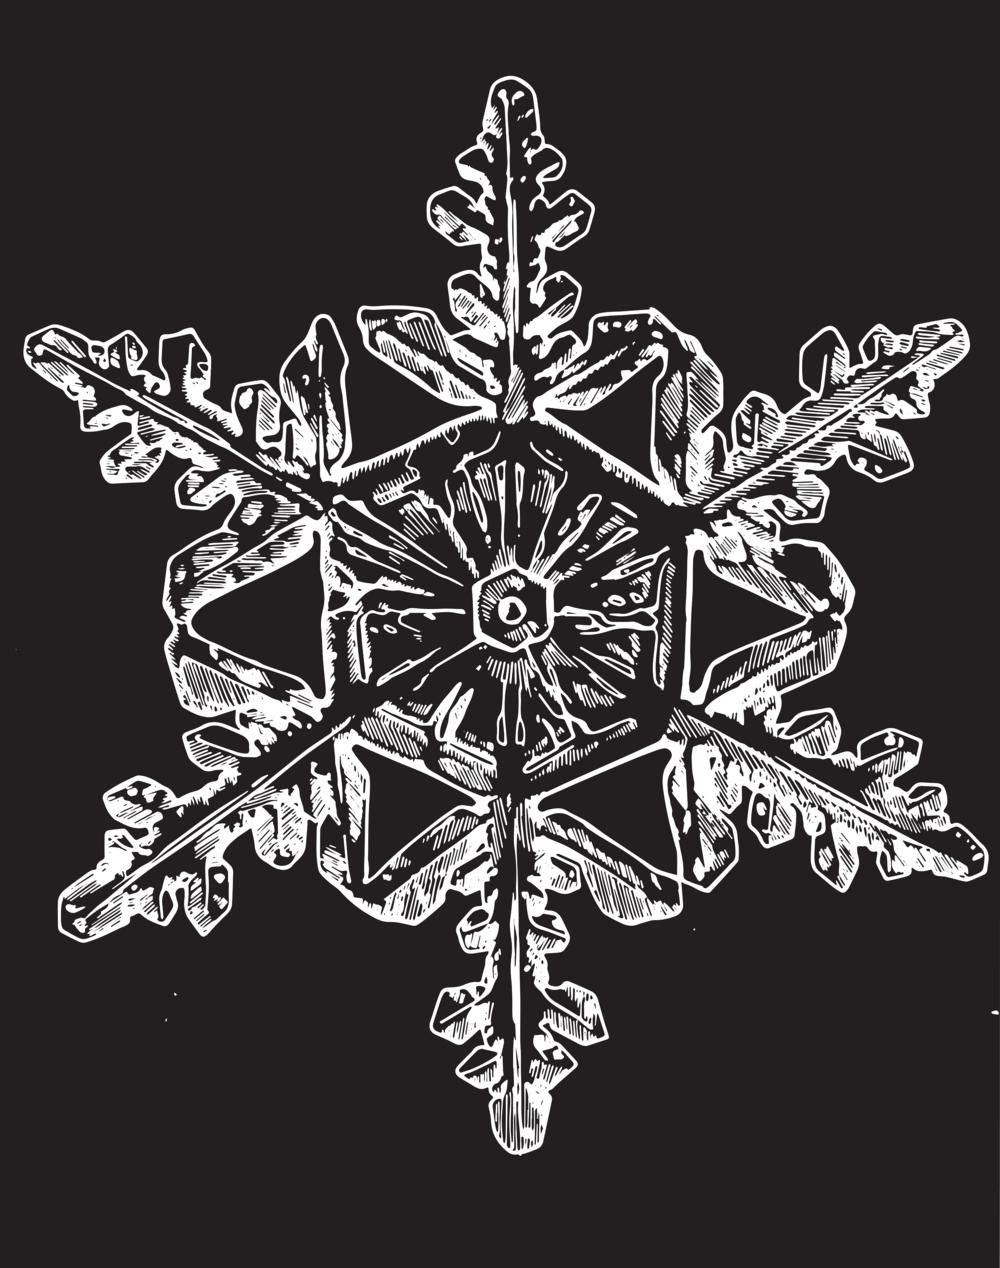 vect_snowflake.png